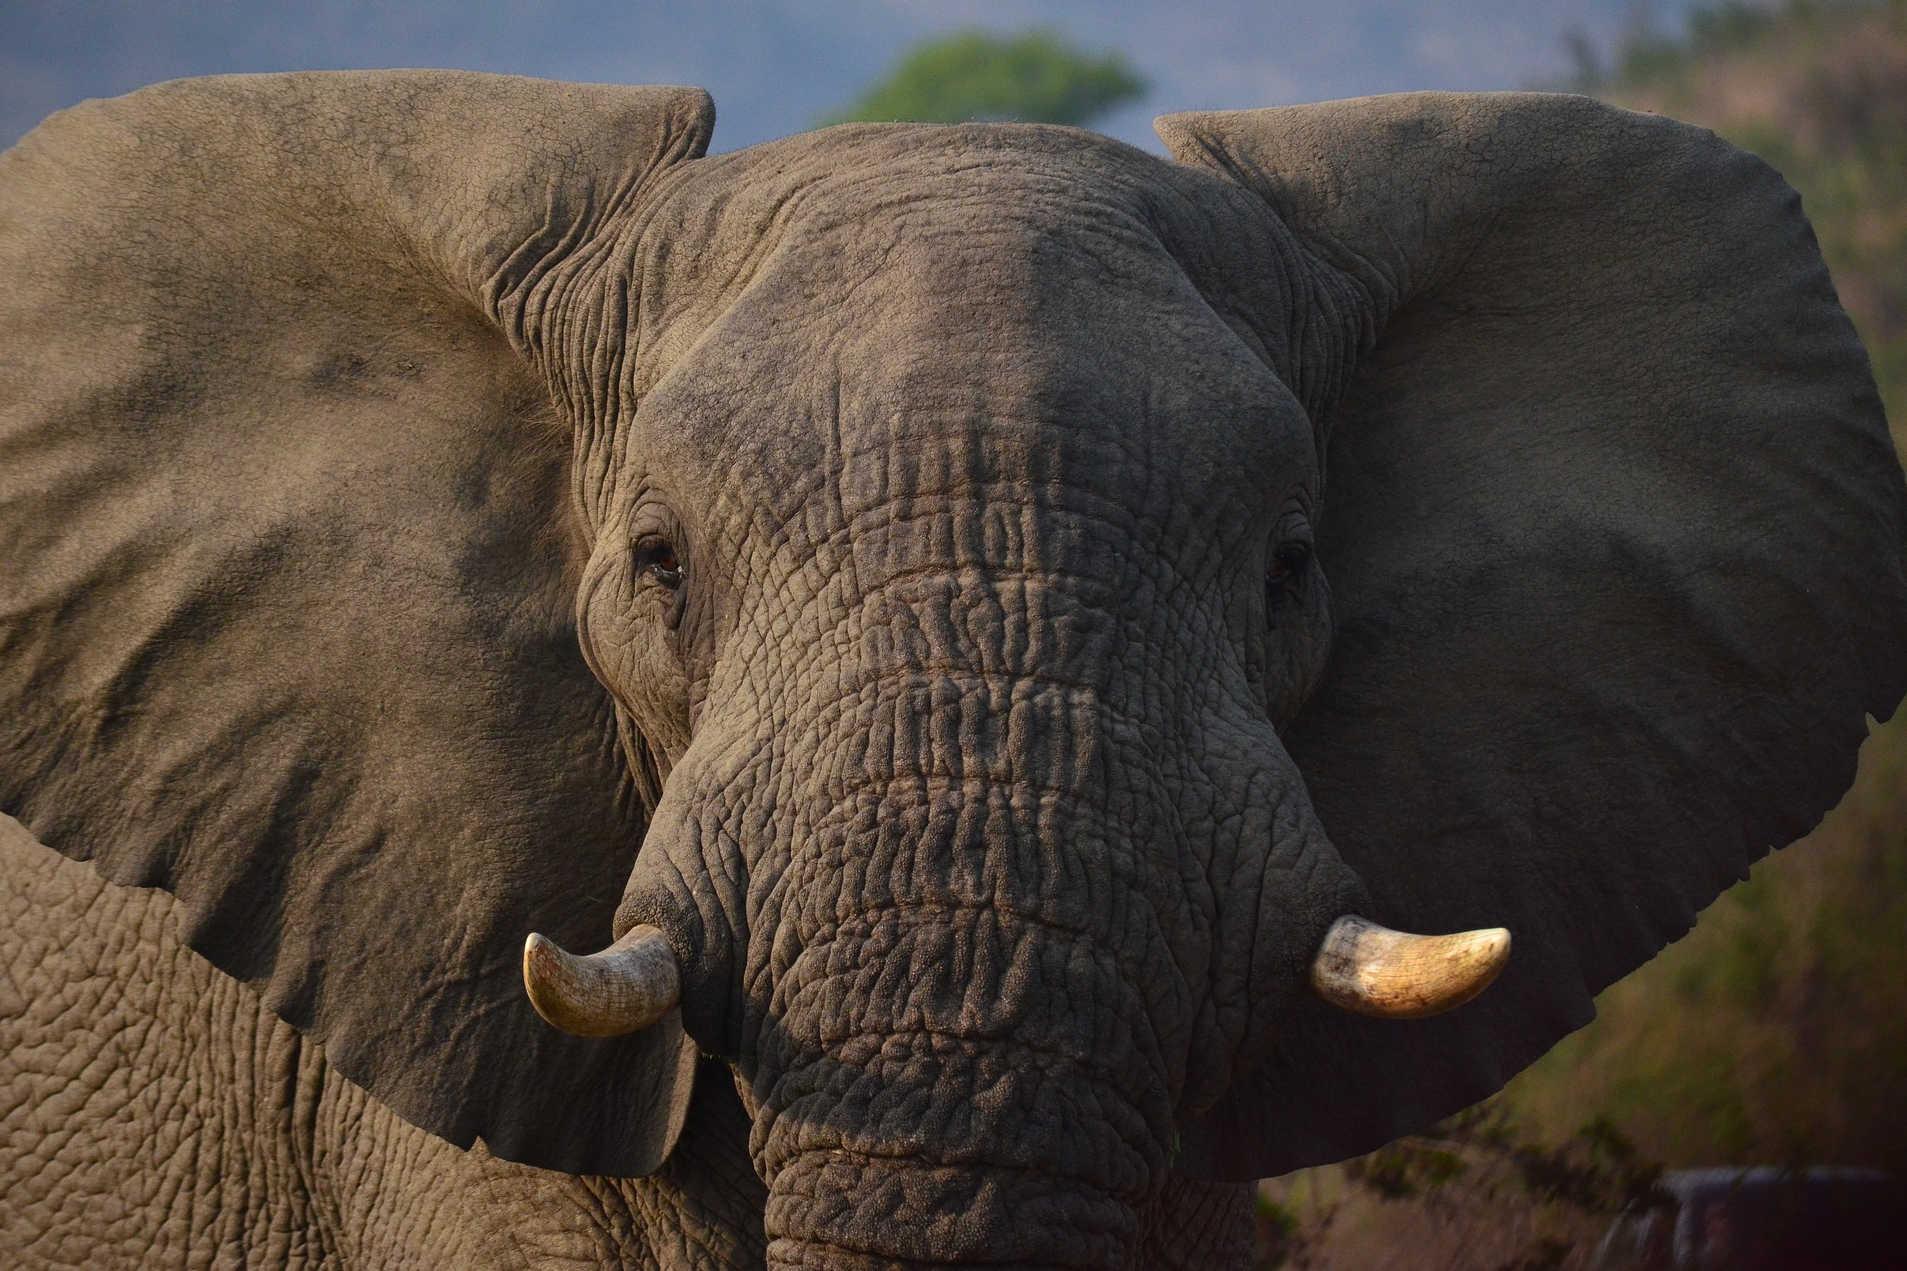 Magical Elephant Encounter